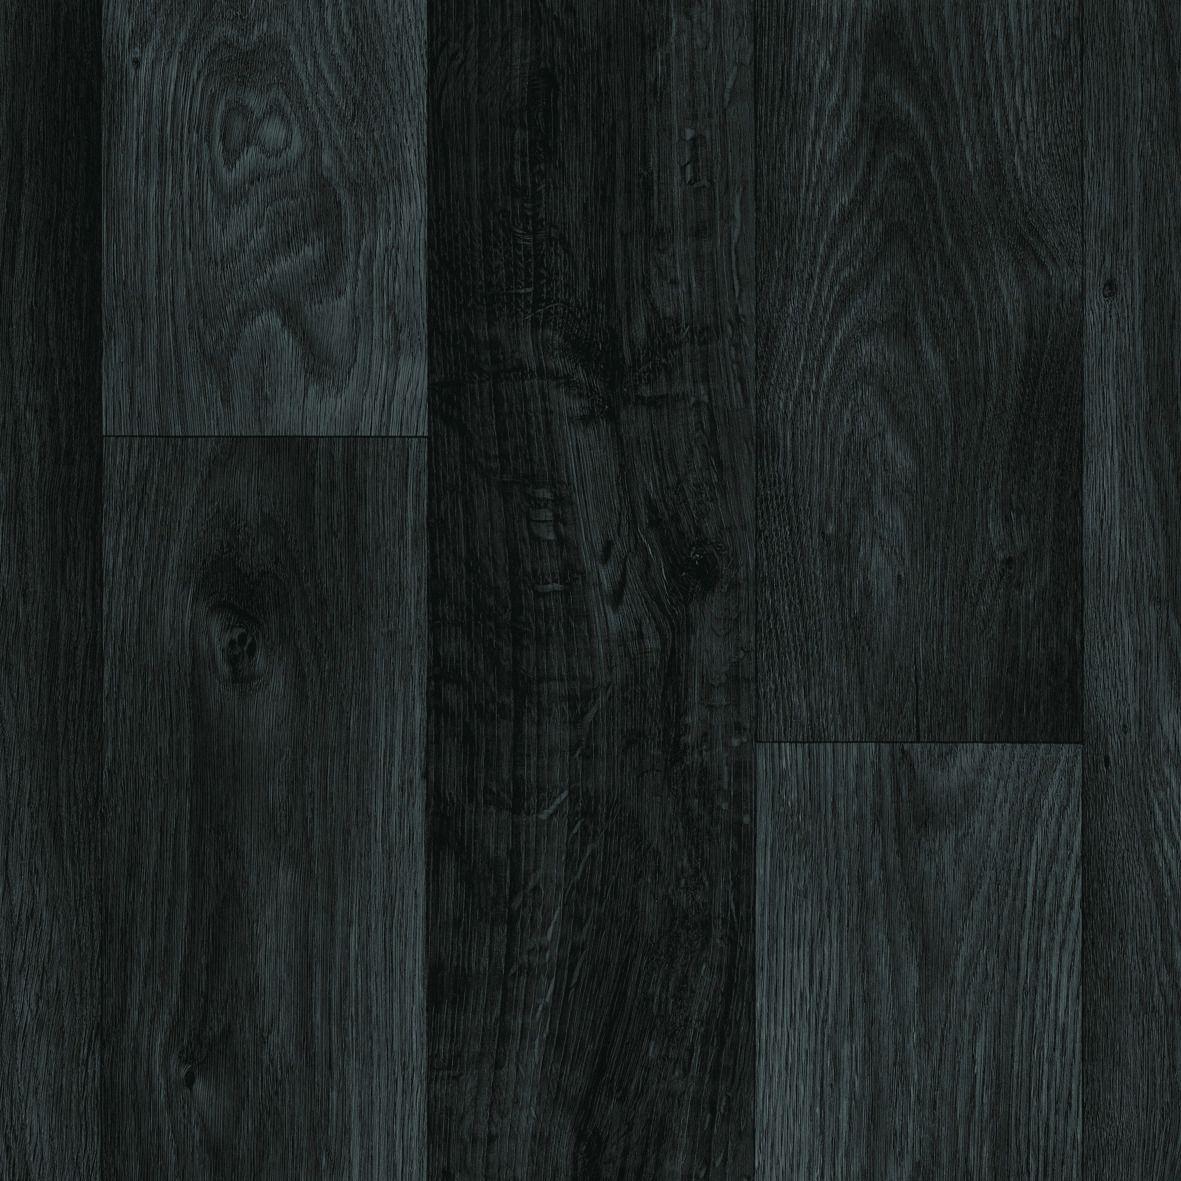 ANDIAMO Andiamo PVC-Boden »Sonic«, Stab-Optik schwarz Nachbildung